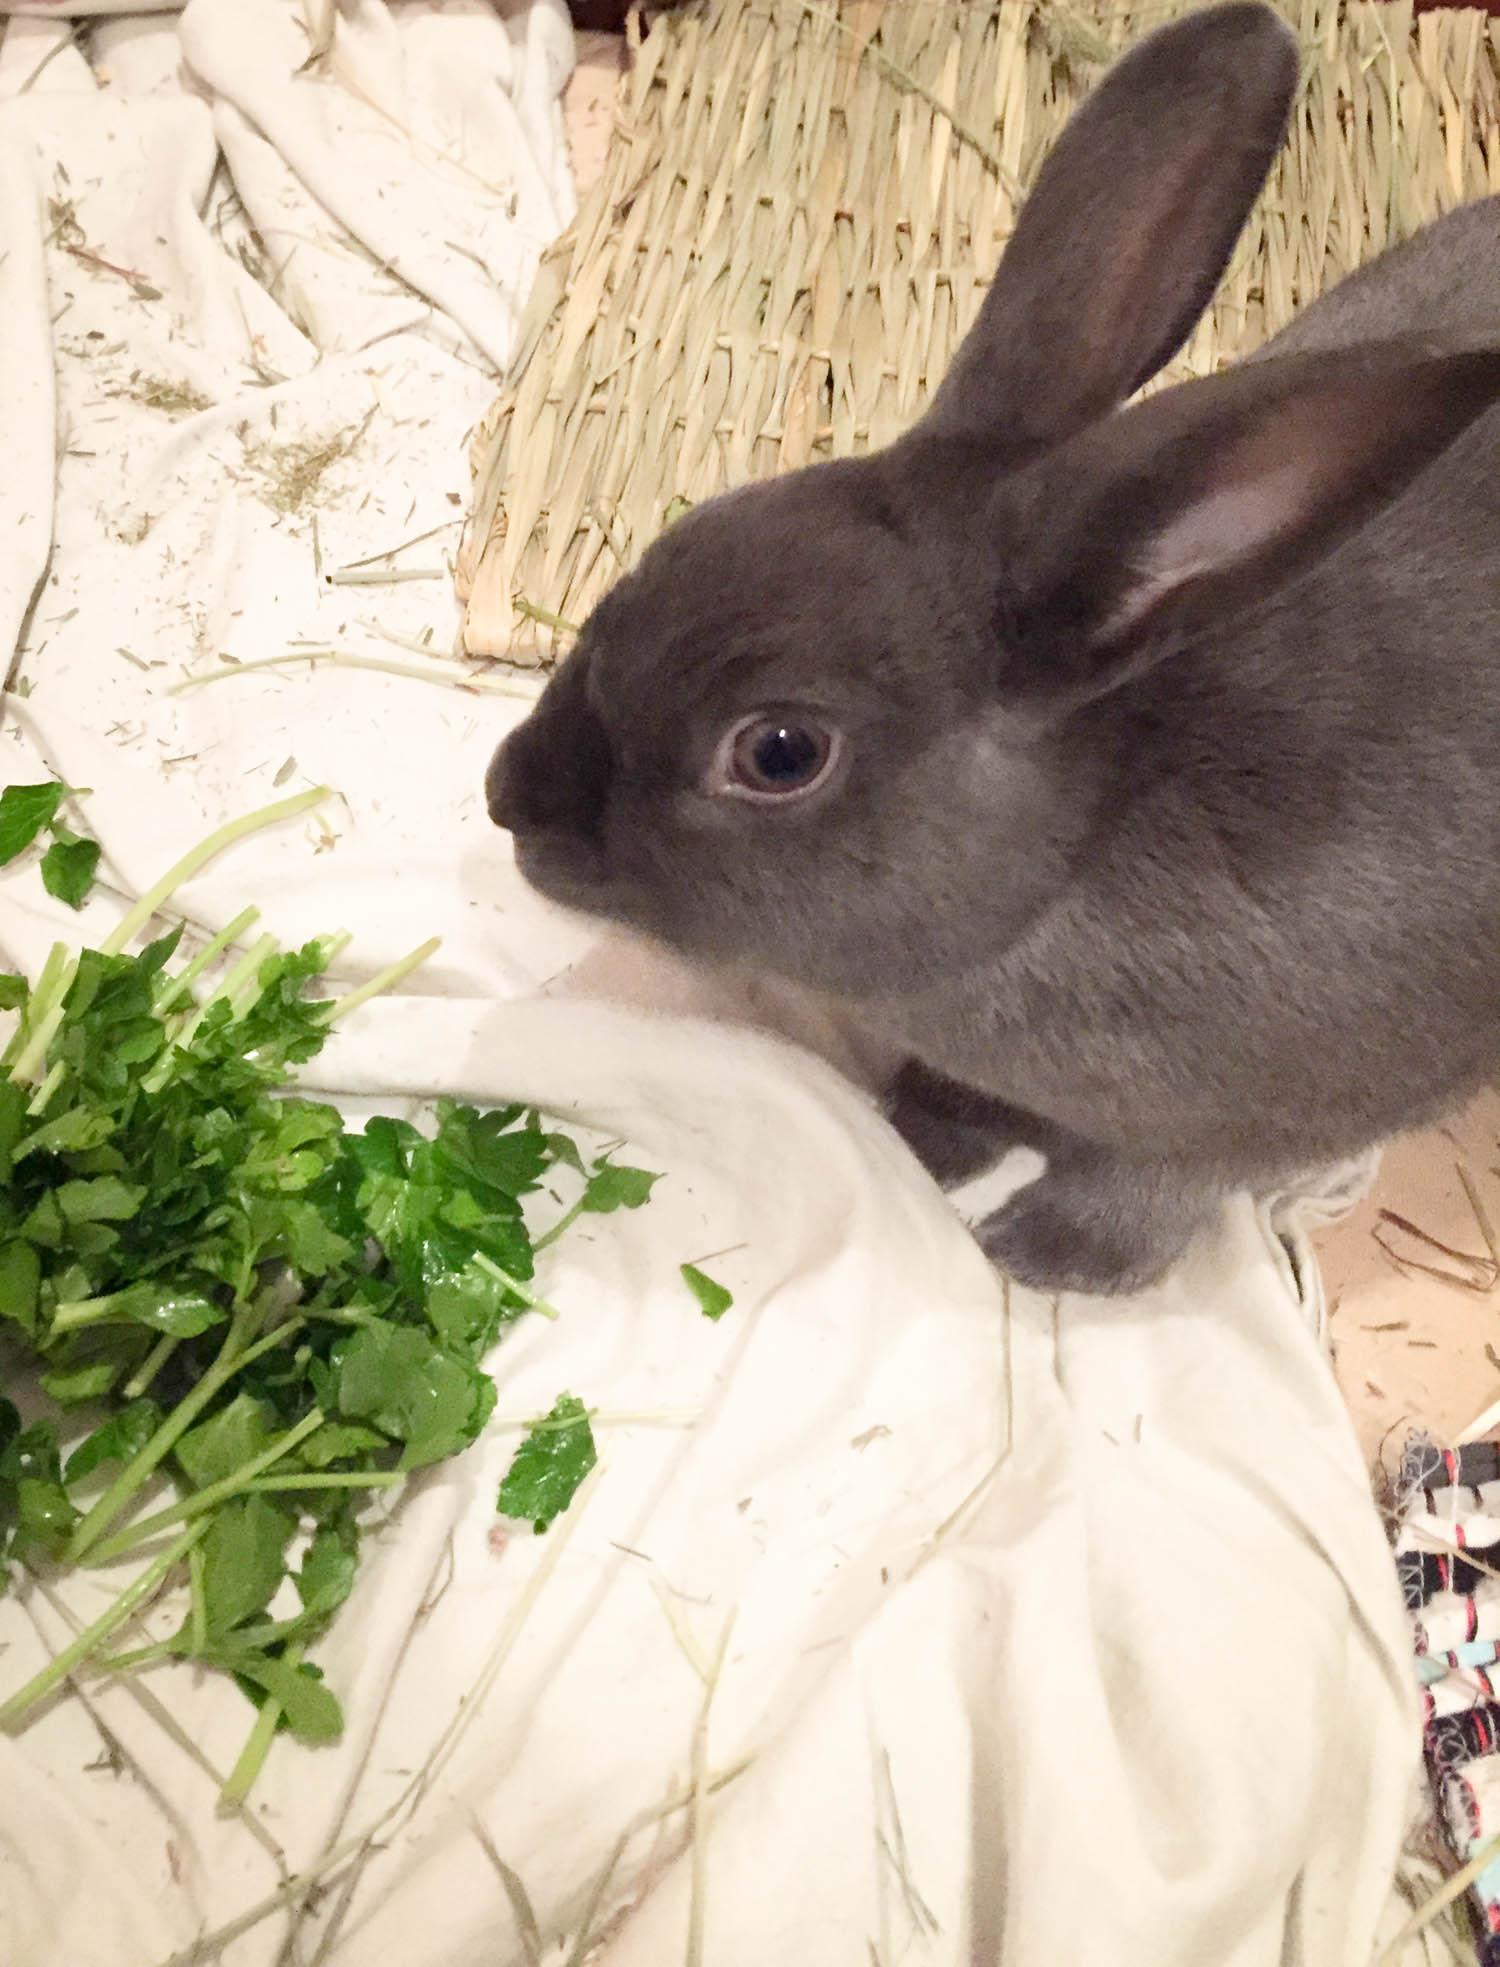 Rey loooves cilantro.